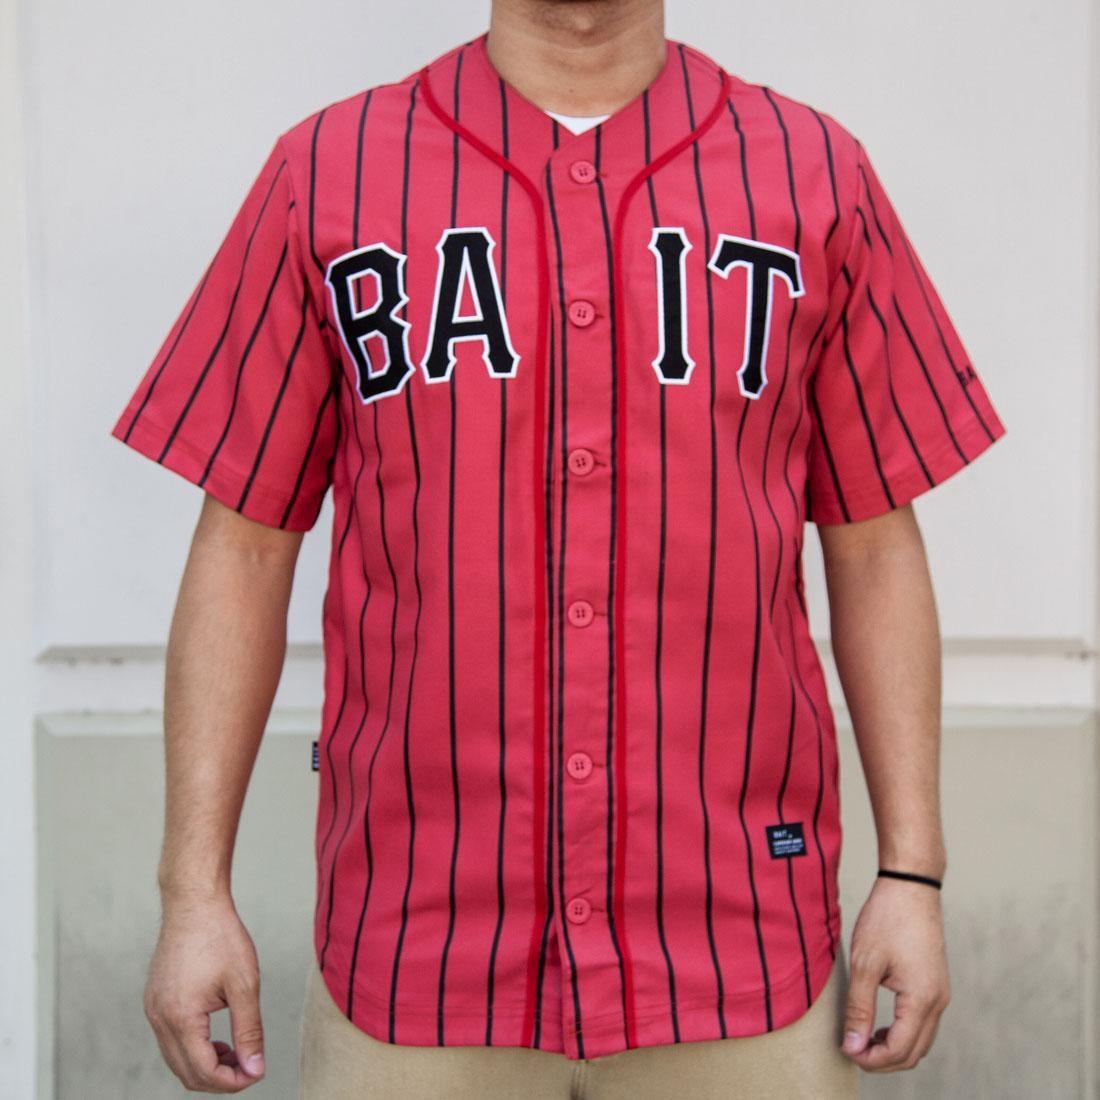 BAIT Men Sluggers Baseball Jersey - Pinstripe (red / black)